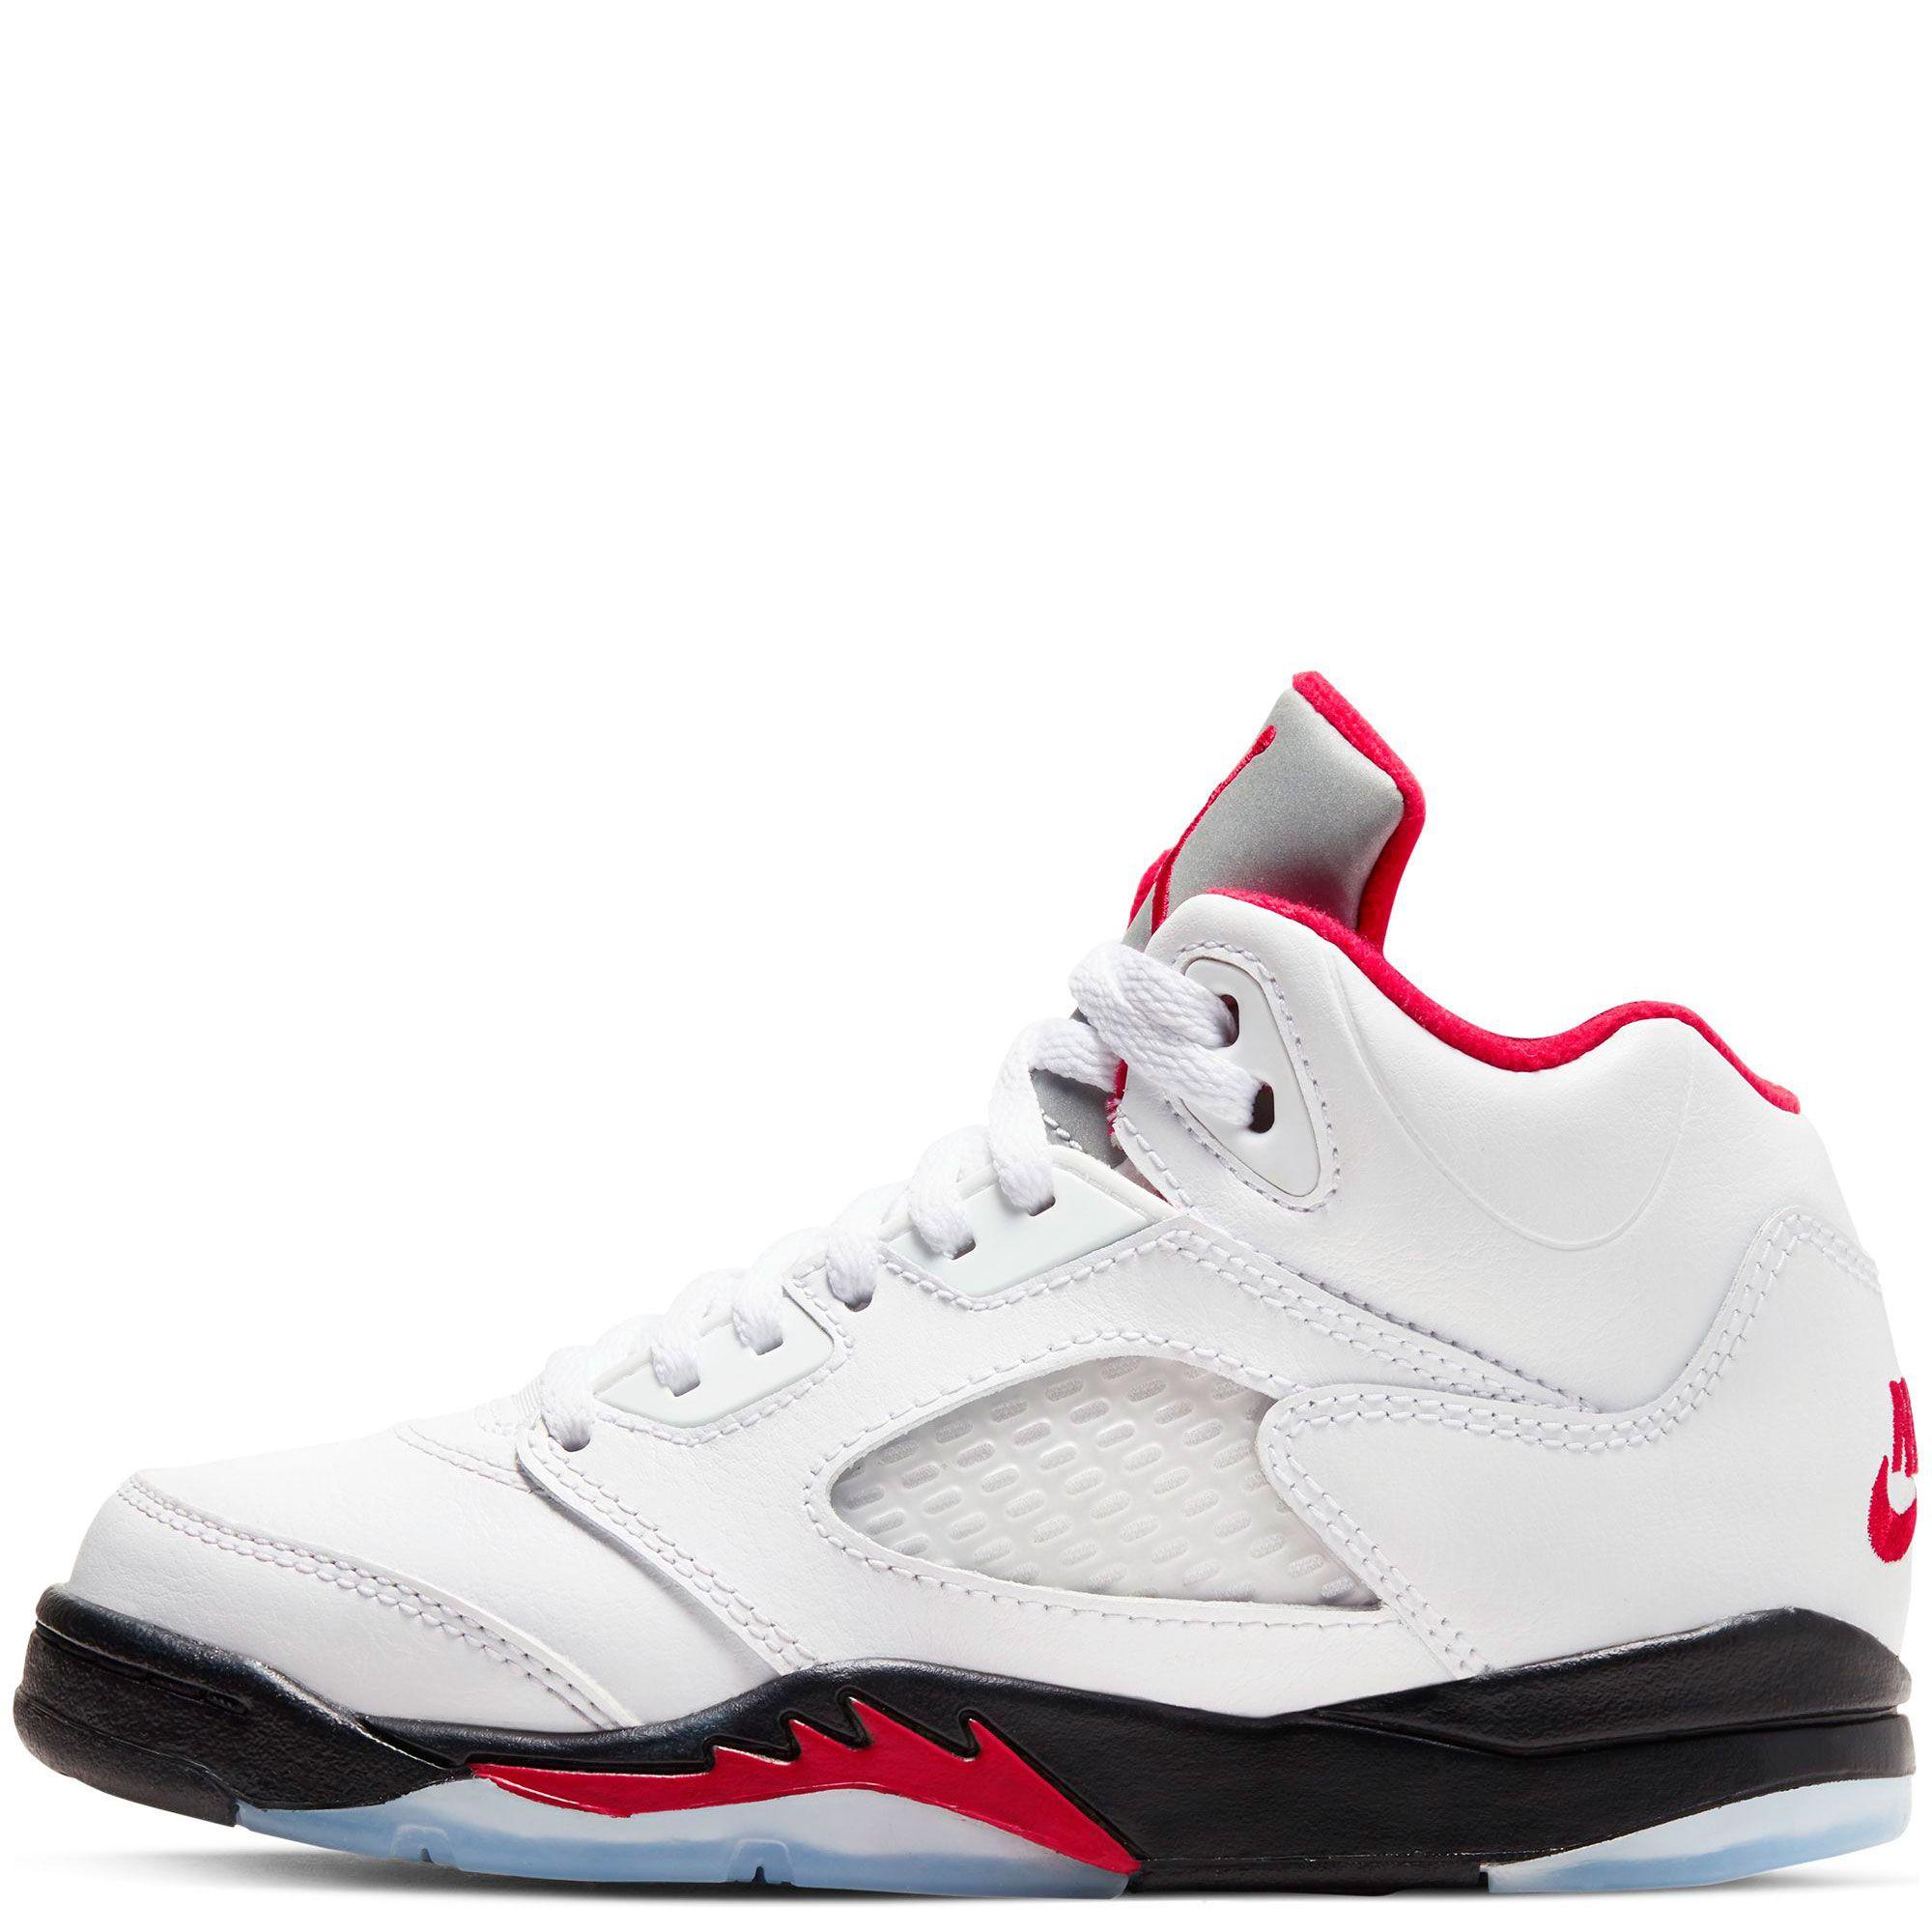 Air Jordan 5 Retro True White/Fire Red